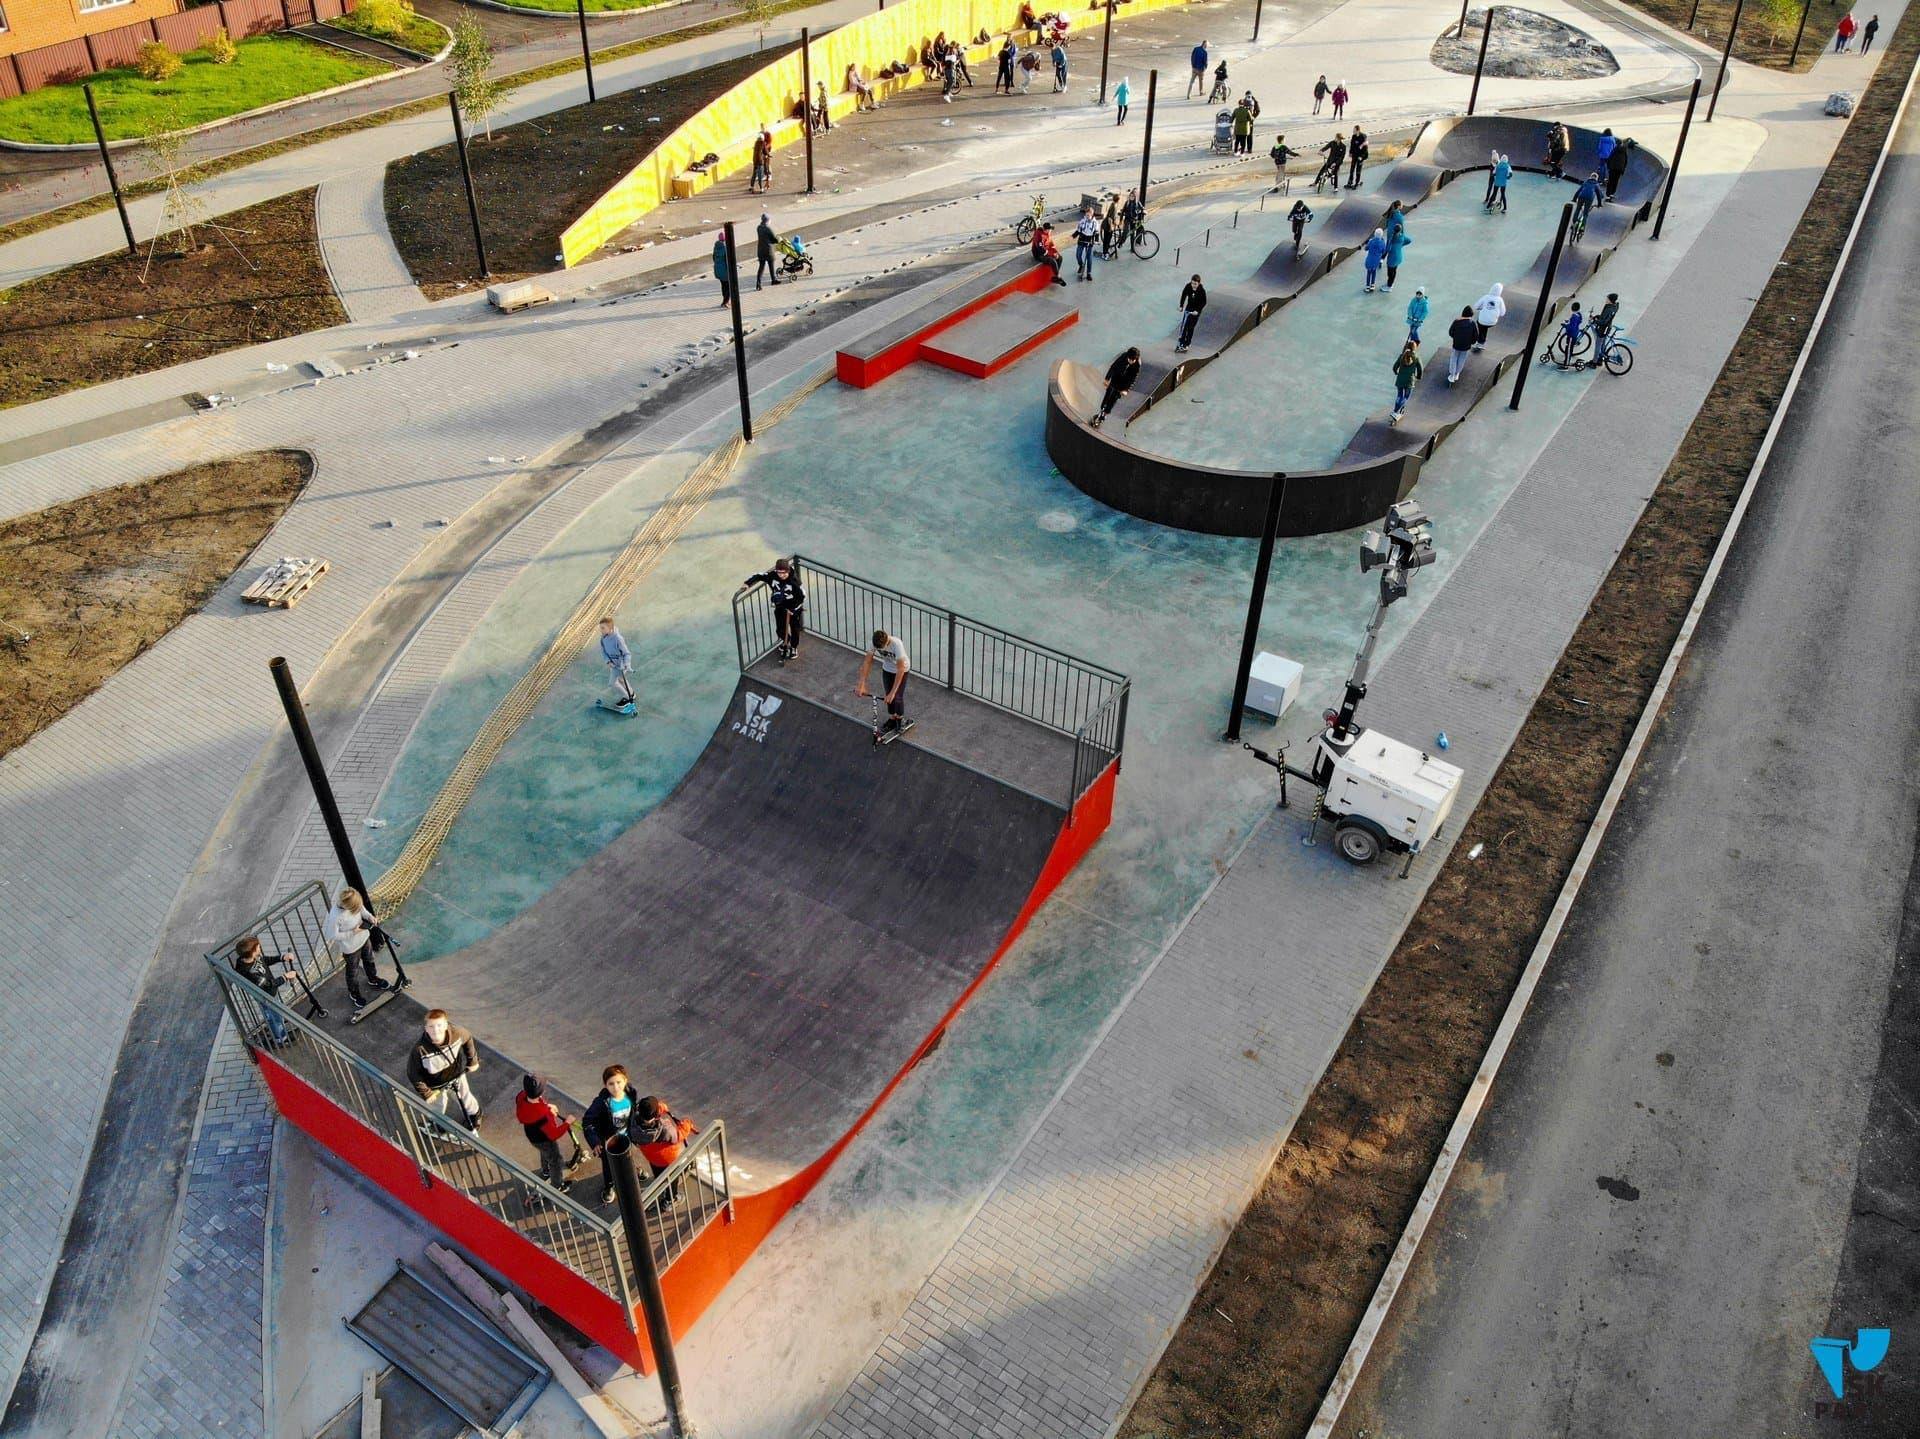 Скейт парк с памп-треком в городе Ишим